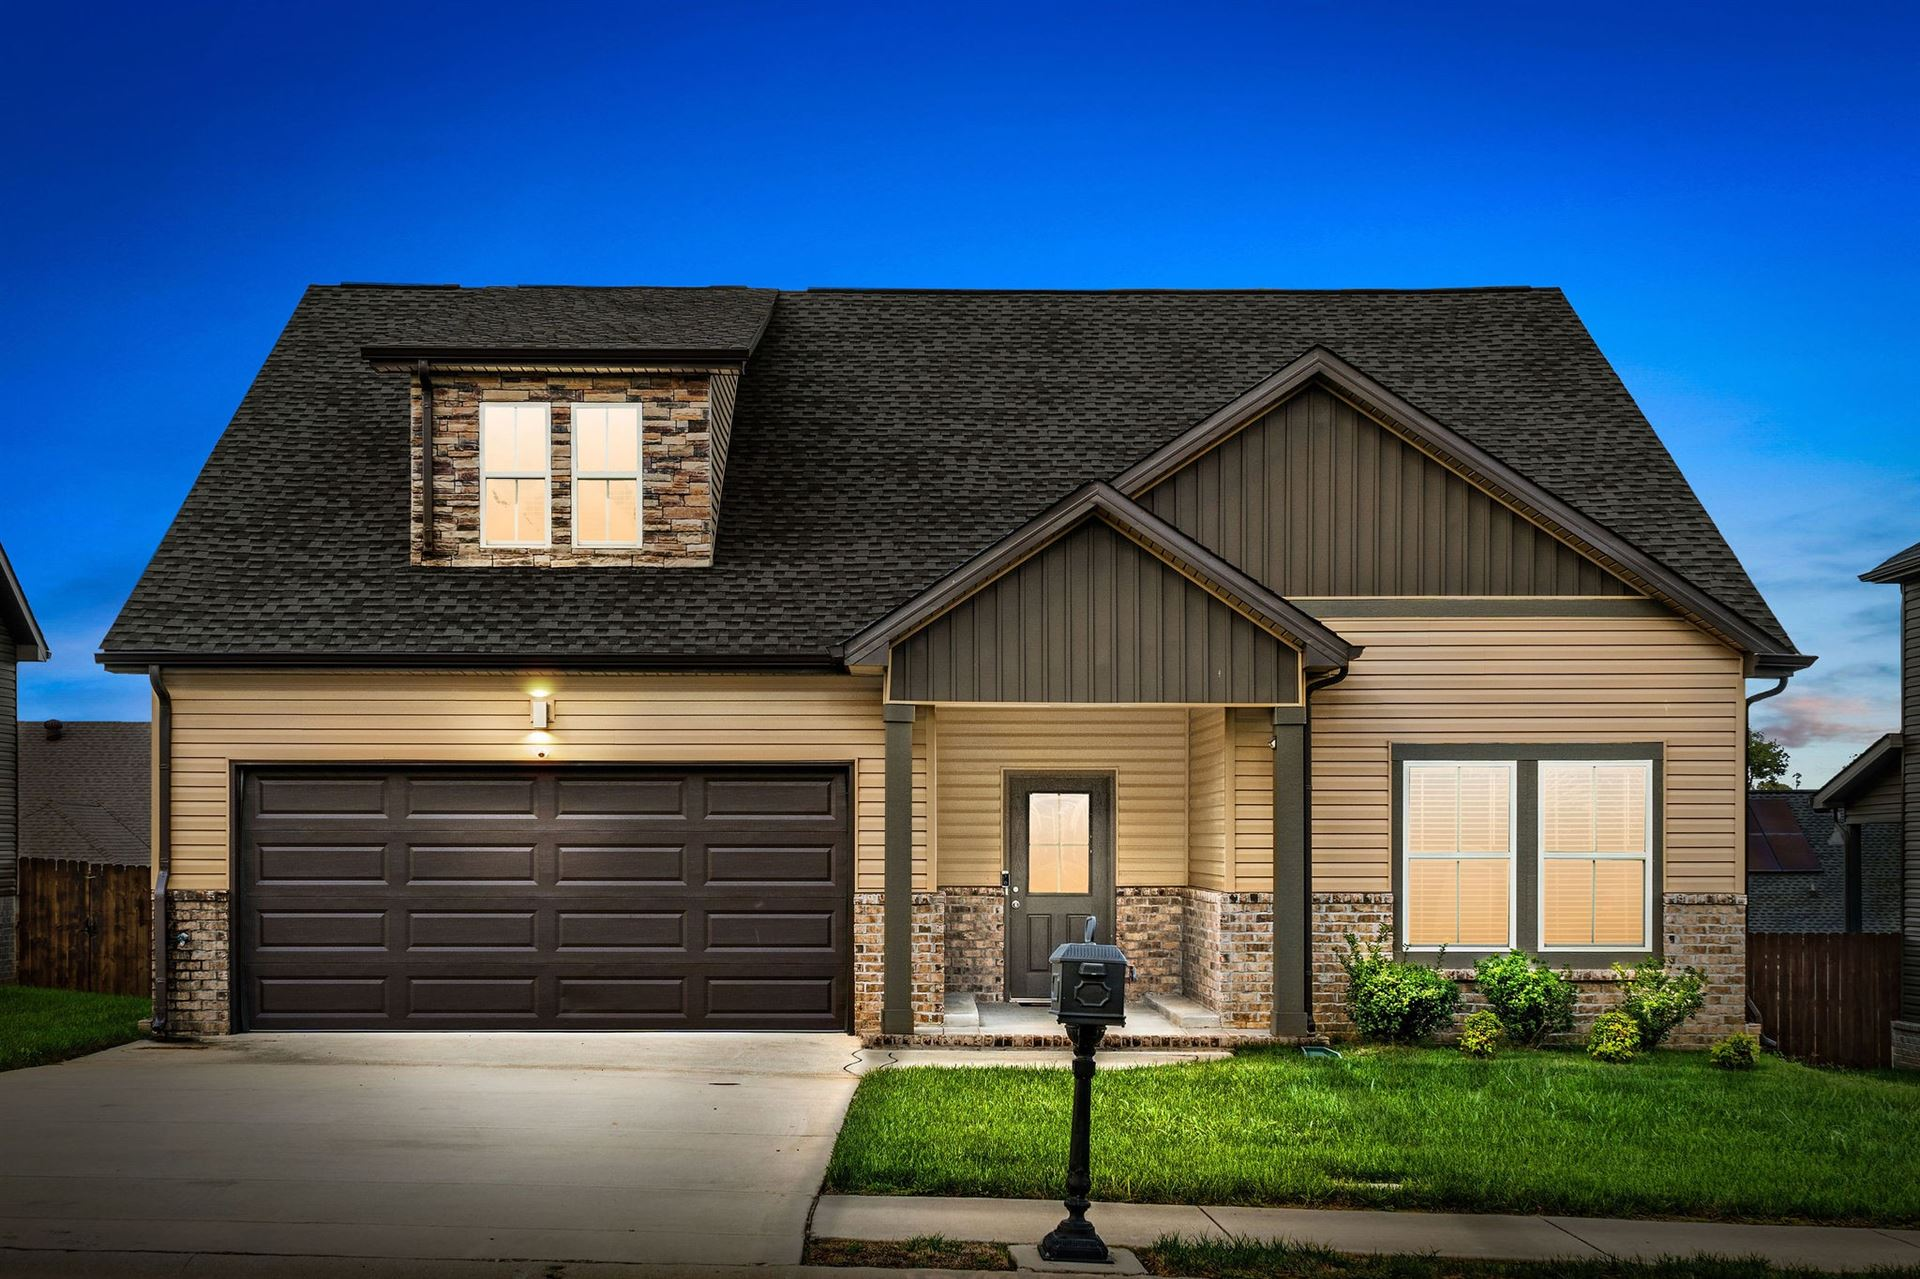 1339 Golden Eagle Way, Clarksville, TN 37040 - MLS#: 2297876